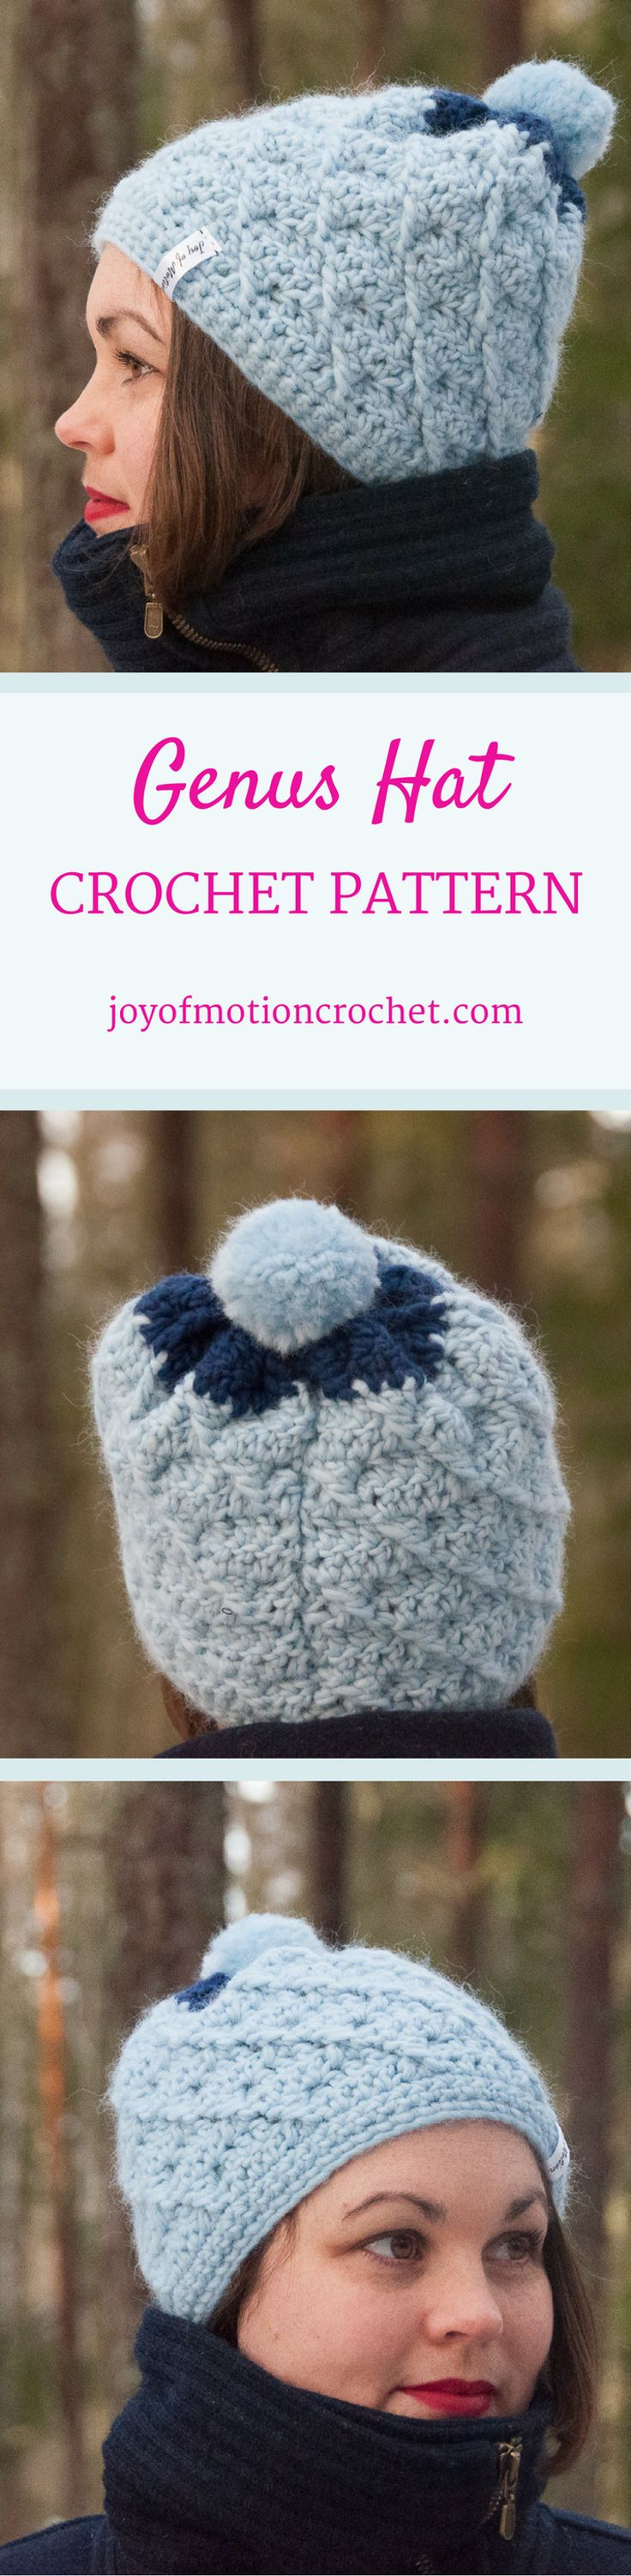 Genus Hat Crochet Pattern | Craftsy